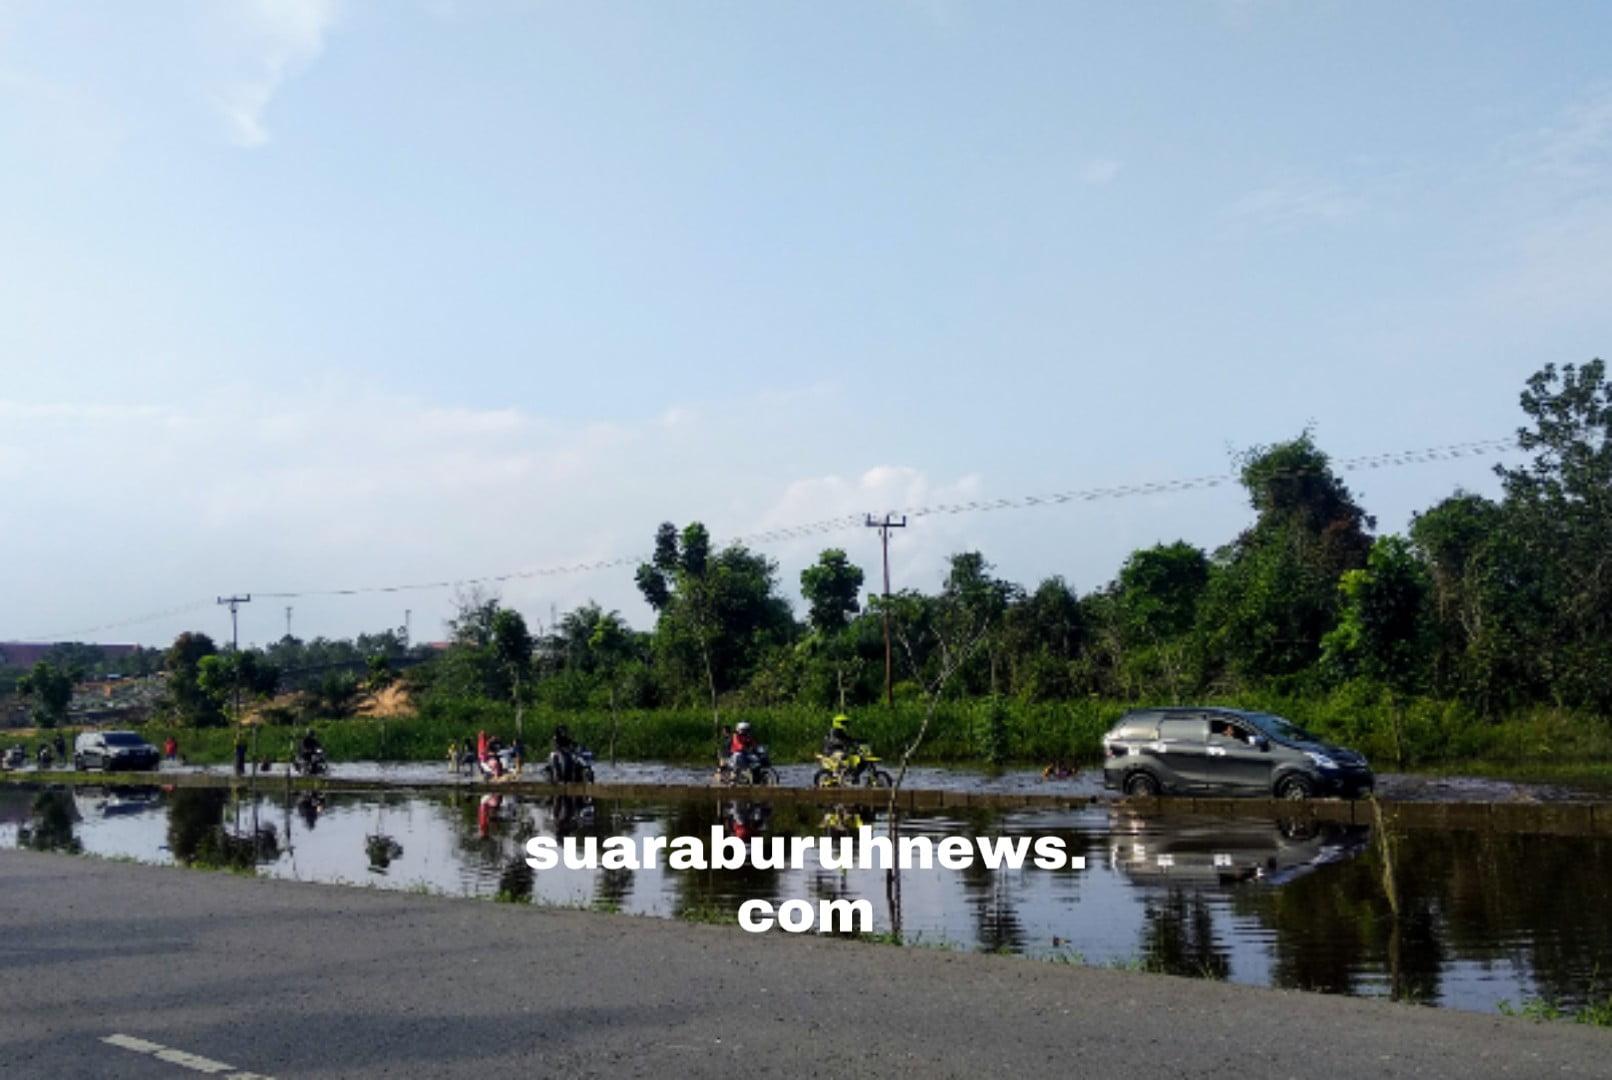 Banjir Terus Naik, Jalan Menuju Kantor Bupati Digenangi Air